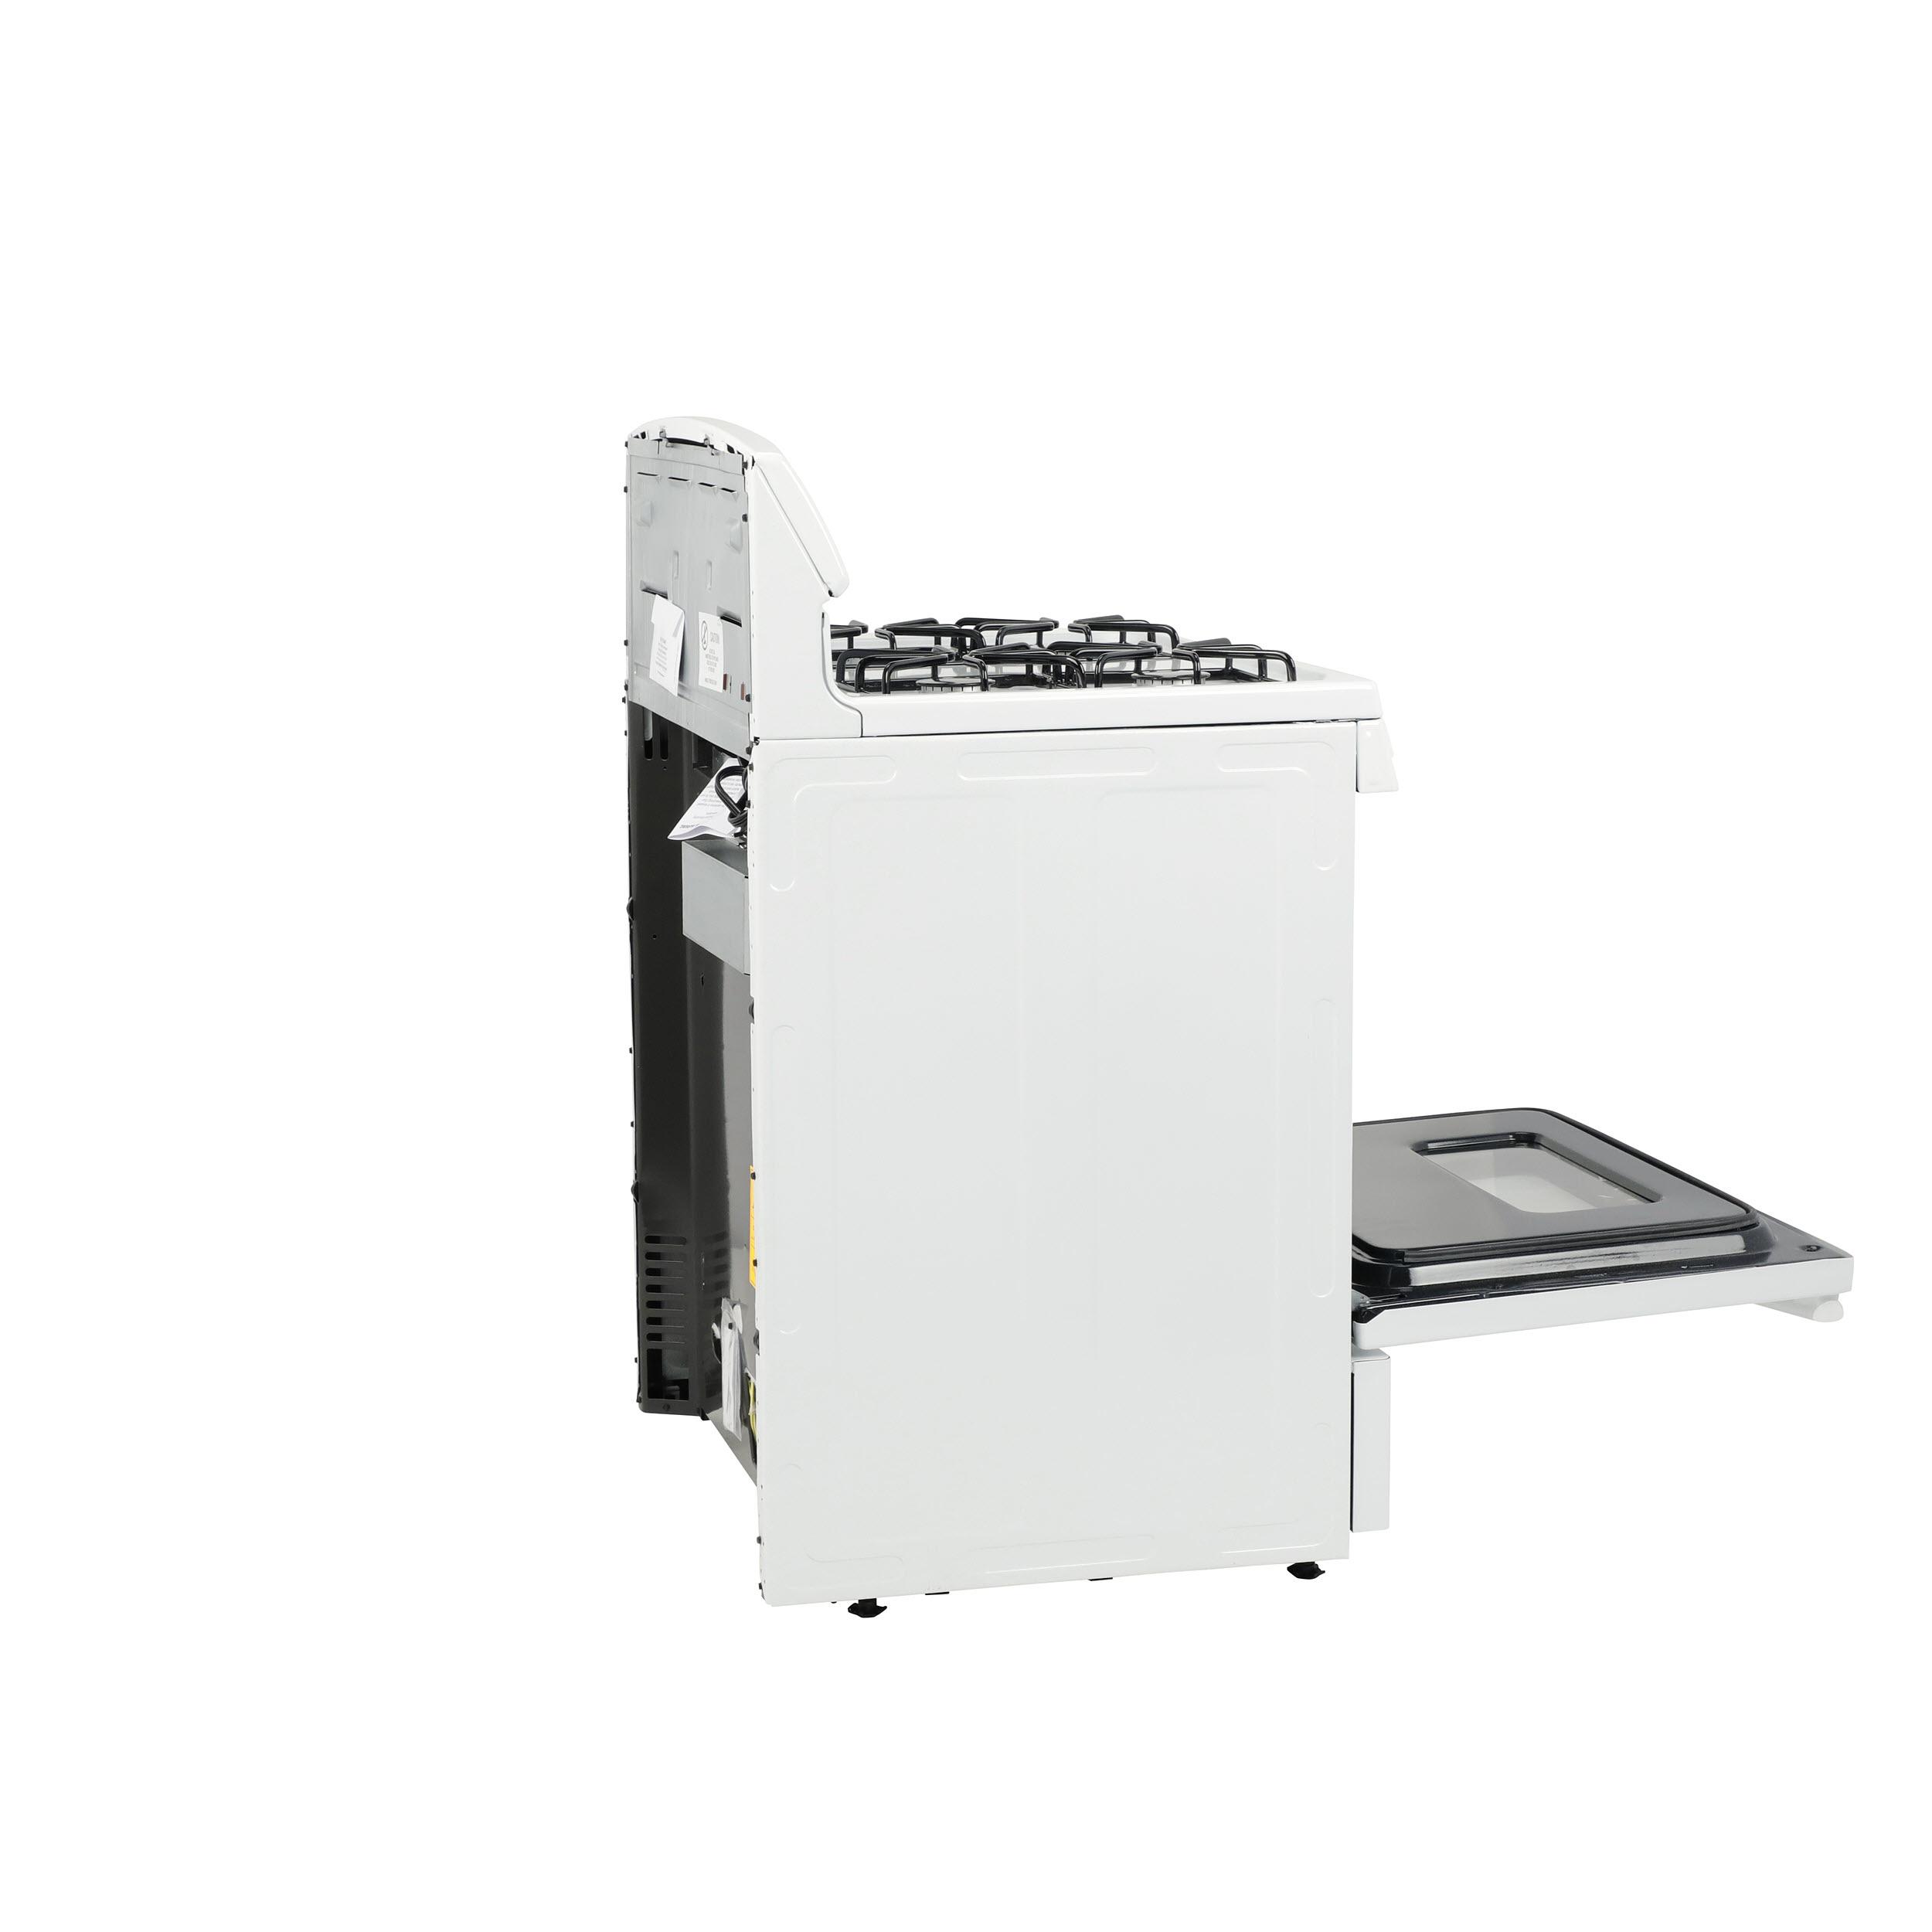 "Model: JGBS10DEMWW   GE GE® 30"" Free-Standing Front Control Gas Range"